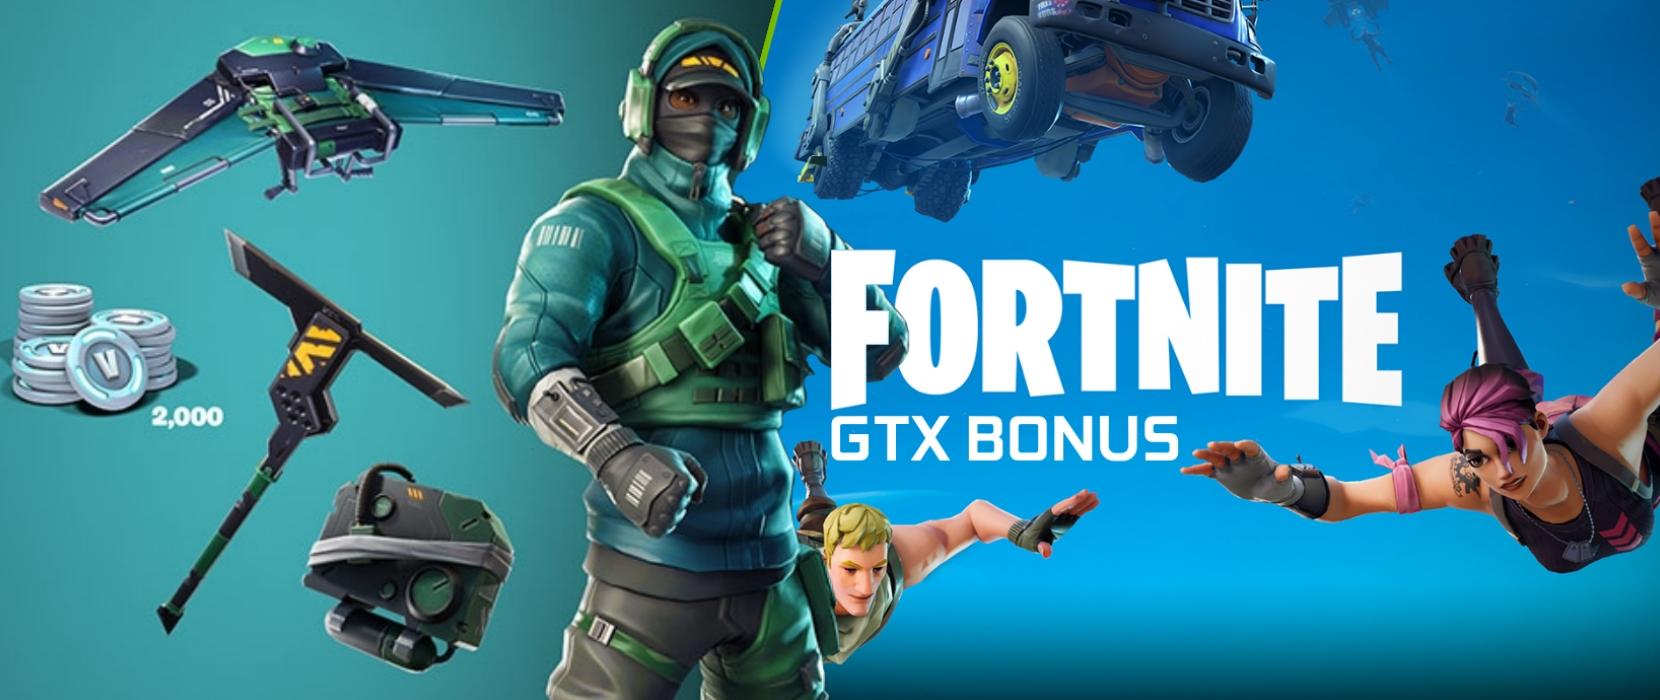 Good Gaming – Fortnite BONUS with GTX 1650, GTX 1660(Ti), GTX 1050